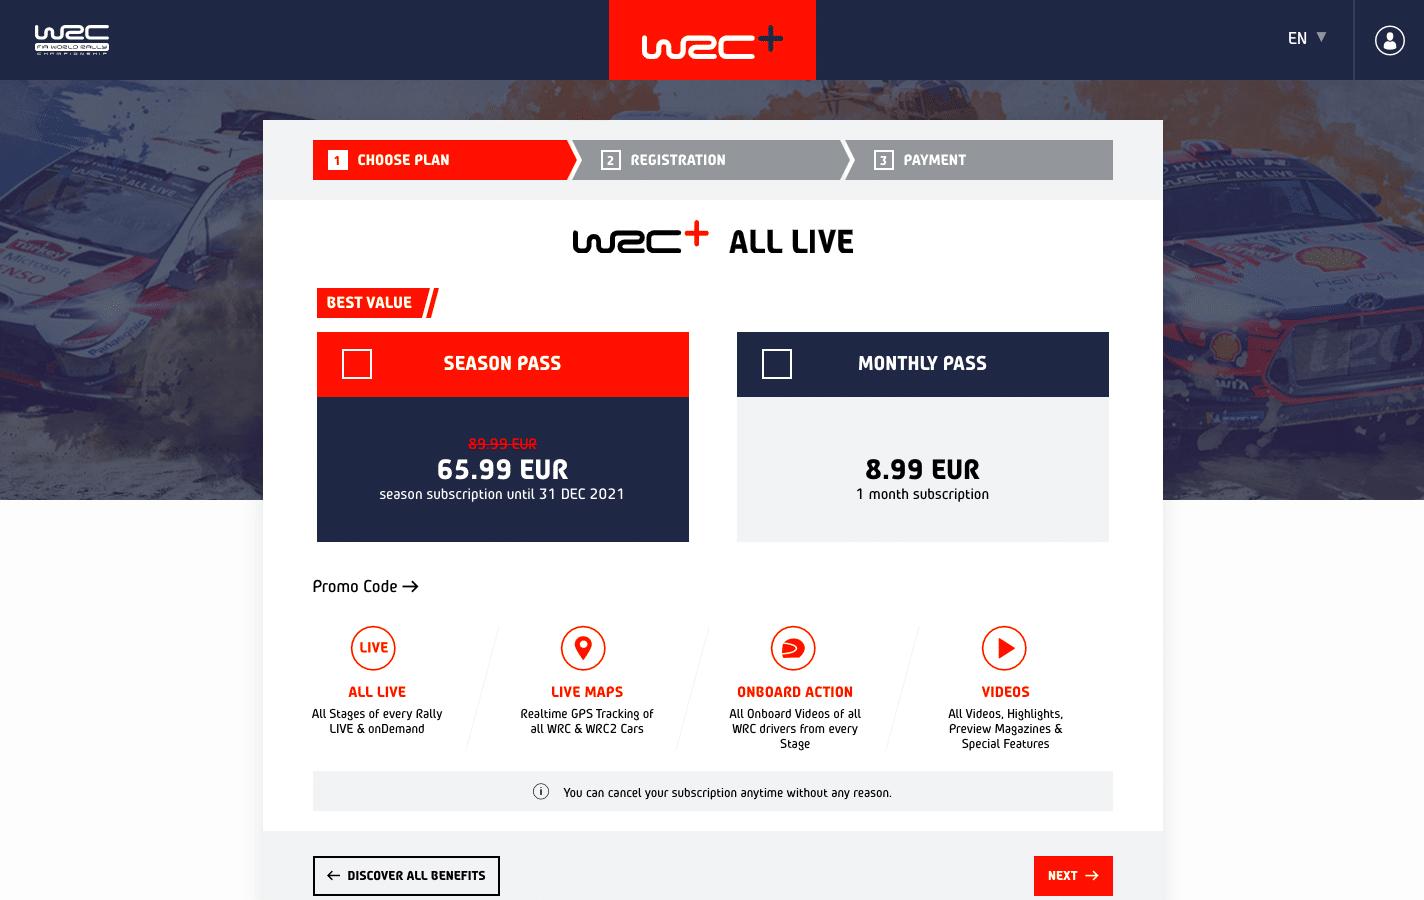 WRC All Live season pass